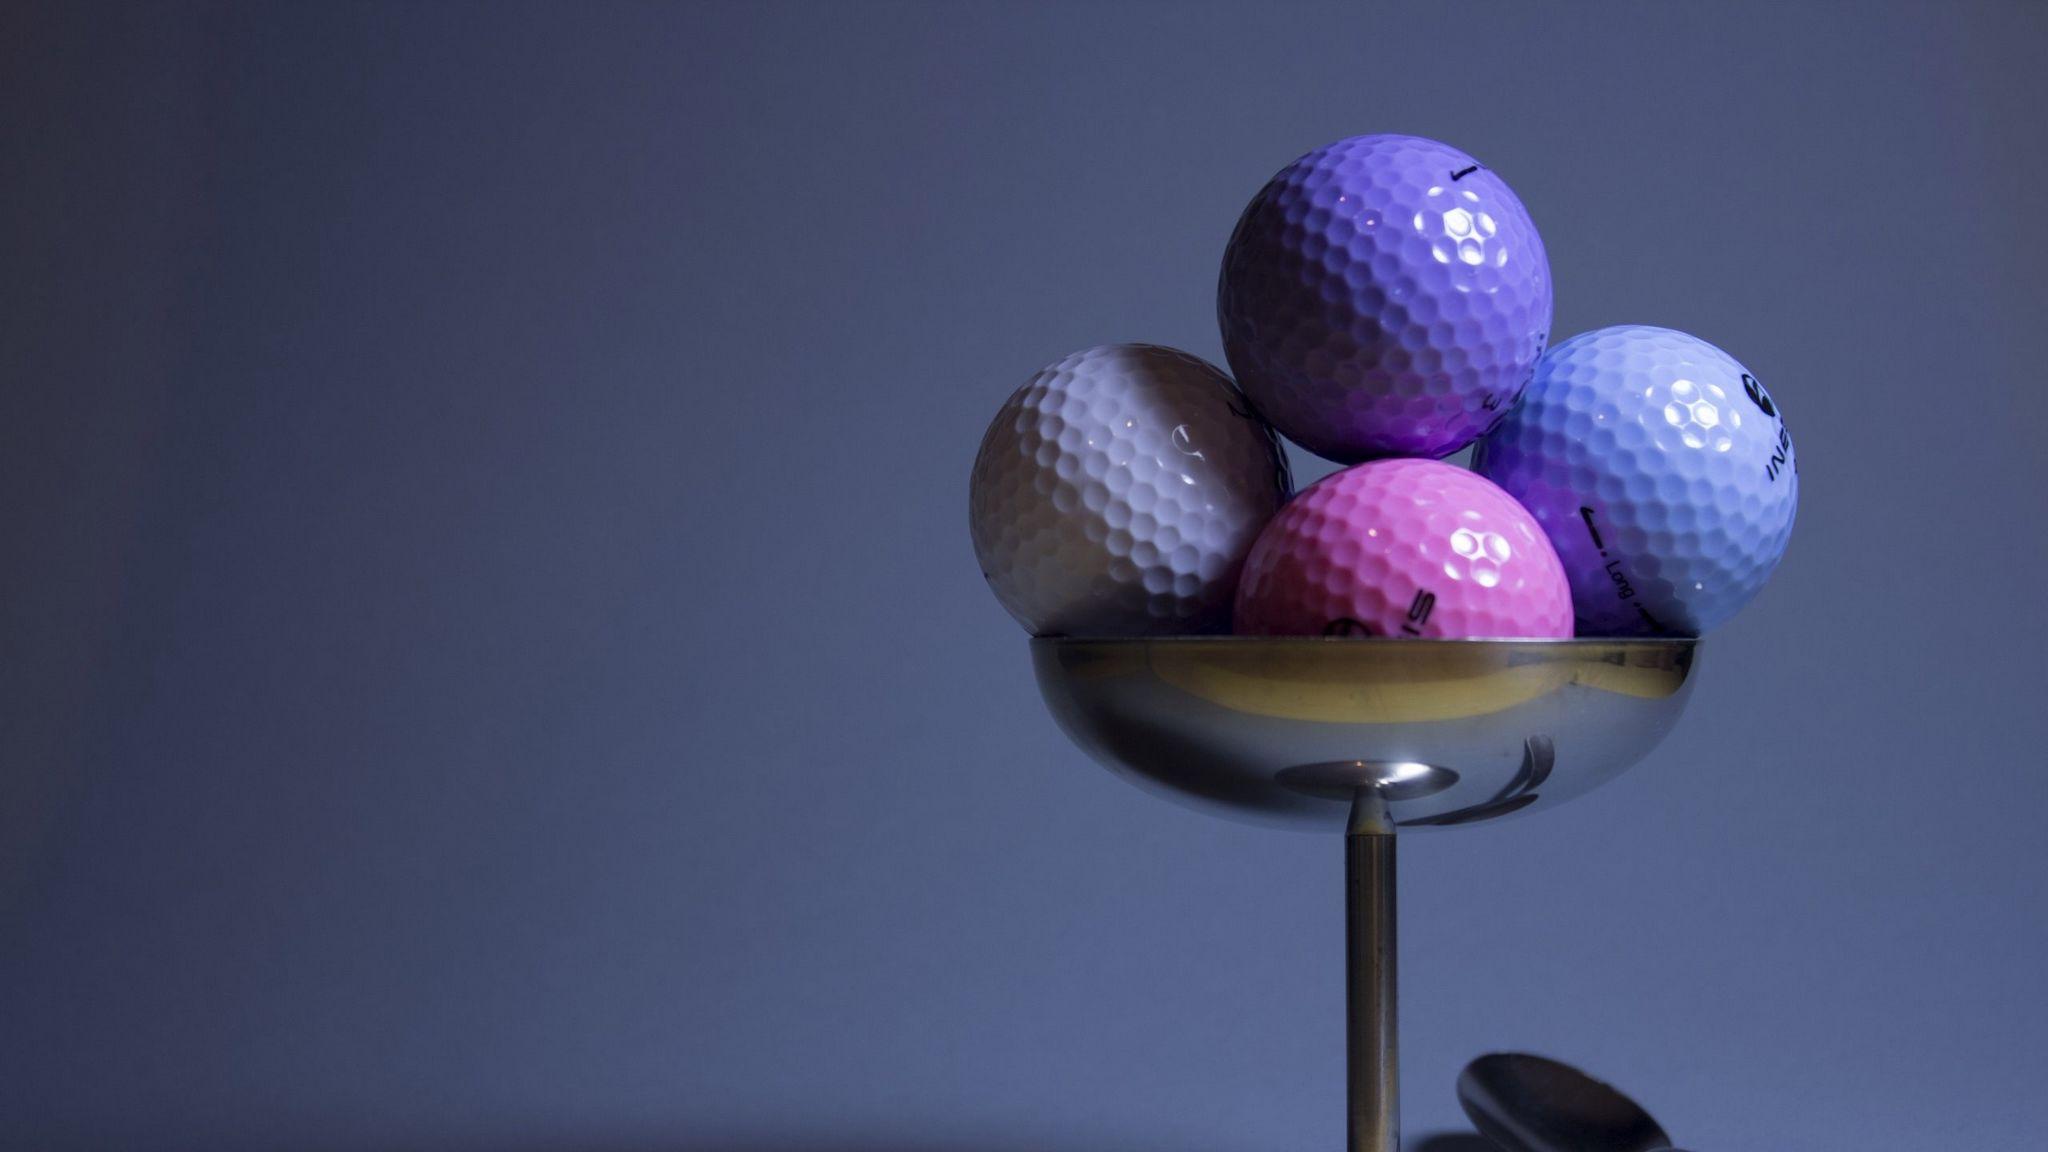 2048x1152 Wallpaper golf, golf balls, imitation, food